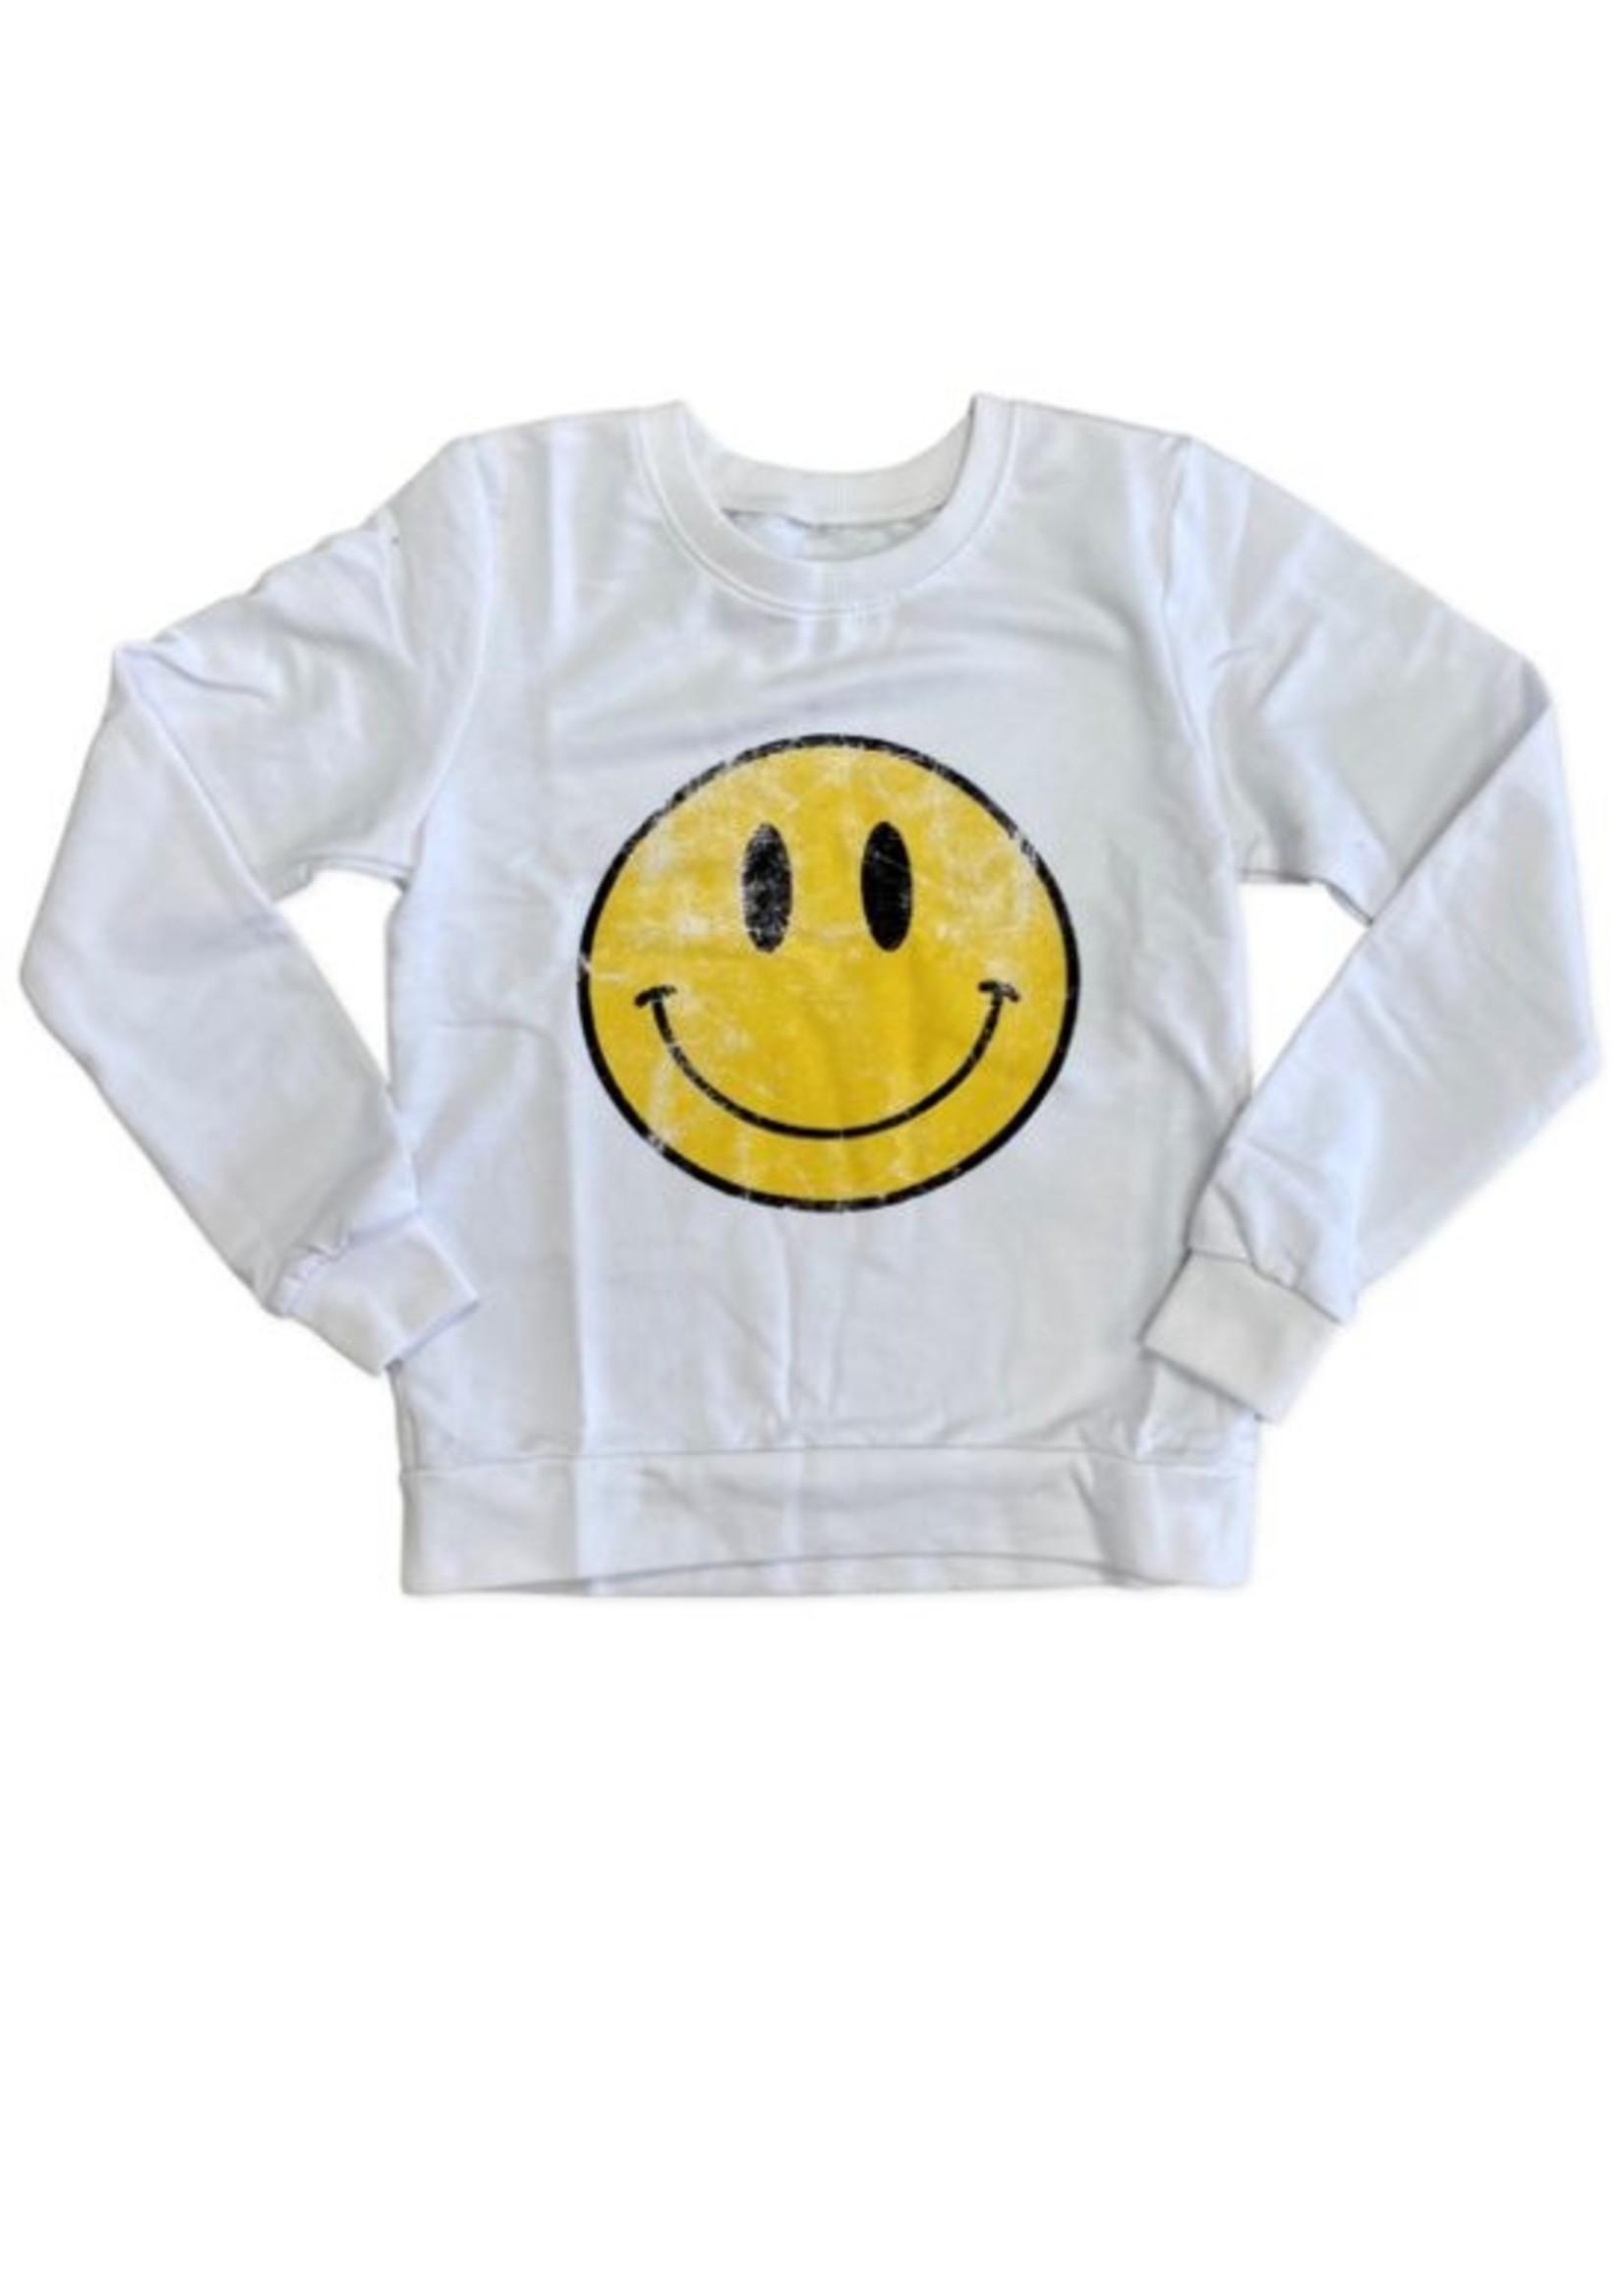 Prince Peter Prince Peter Vintage Smiley Sweatshirt - White